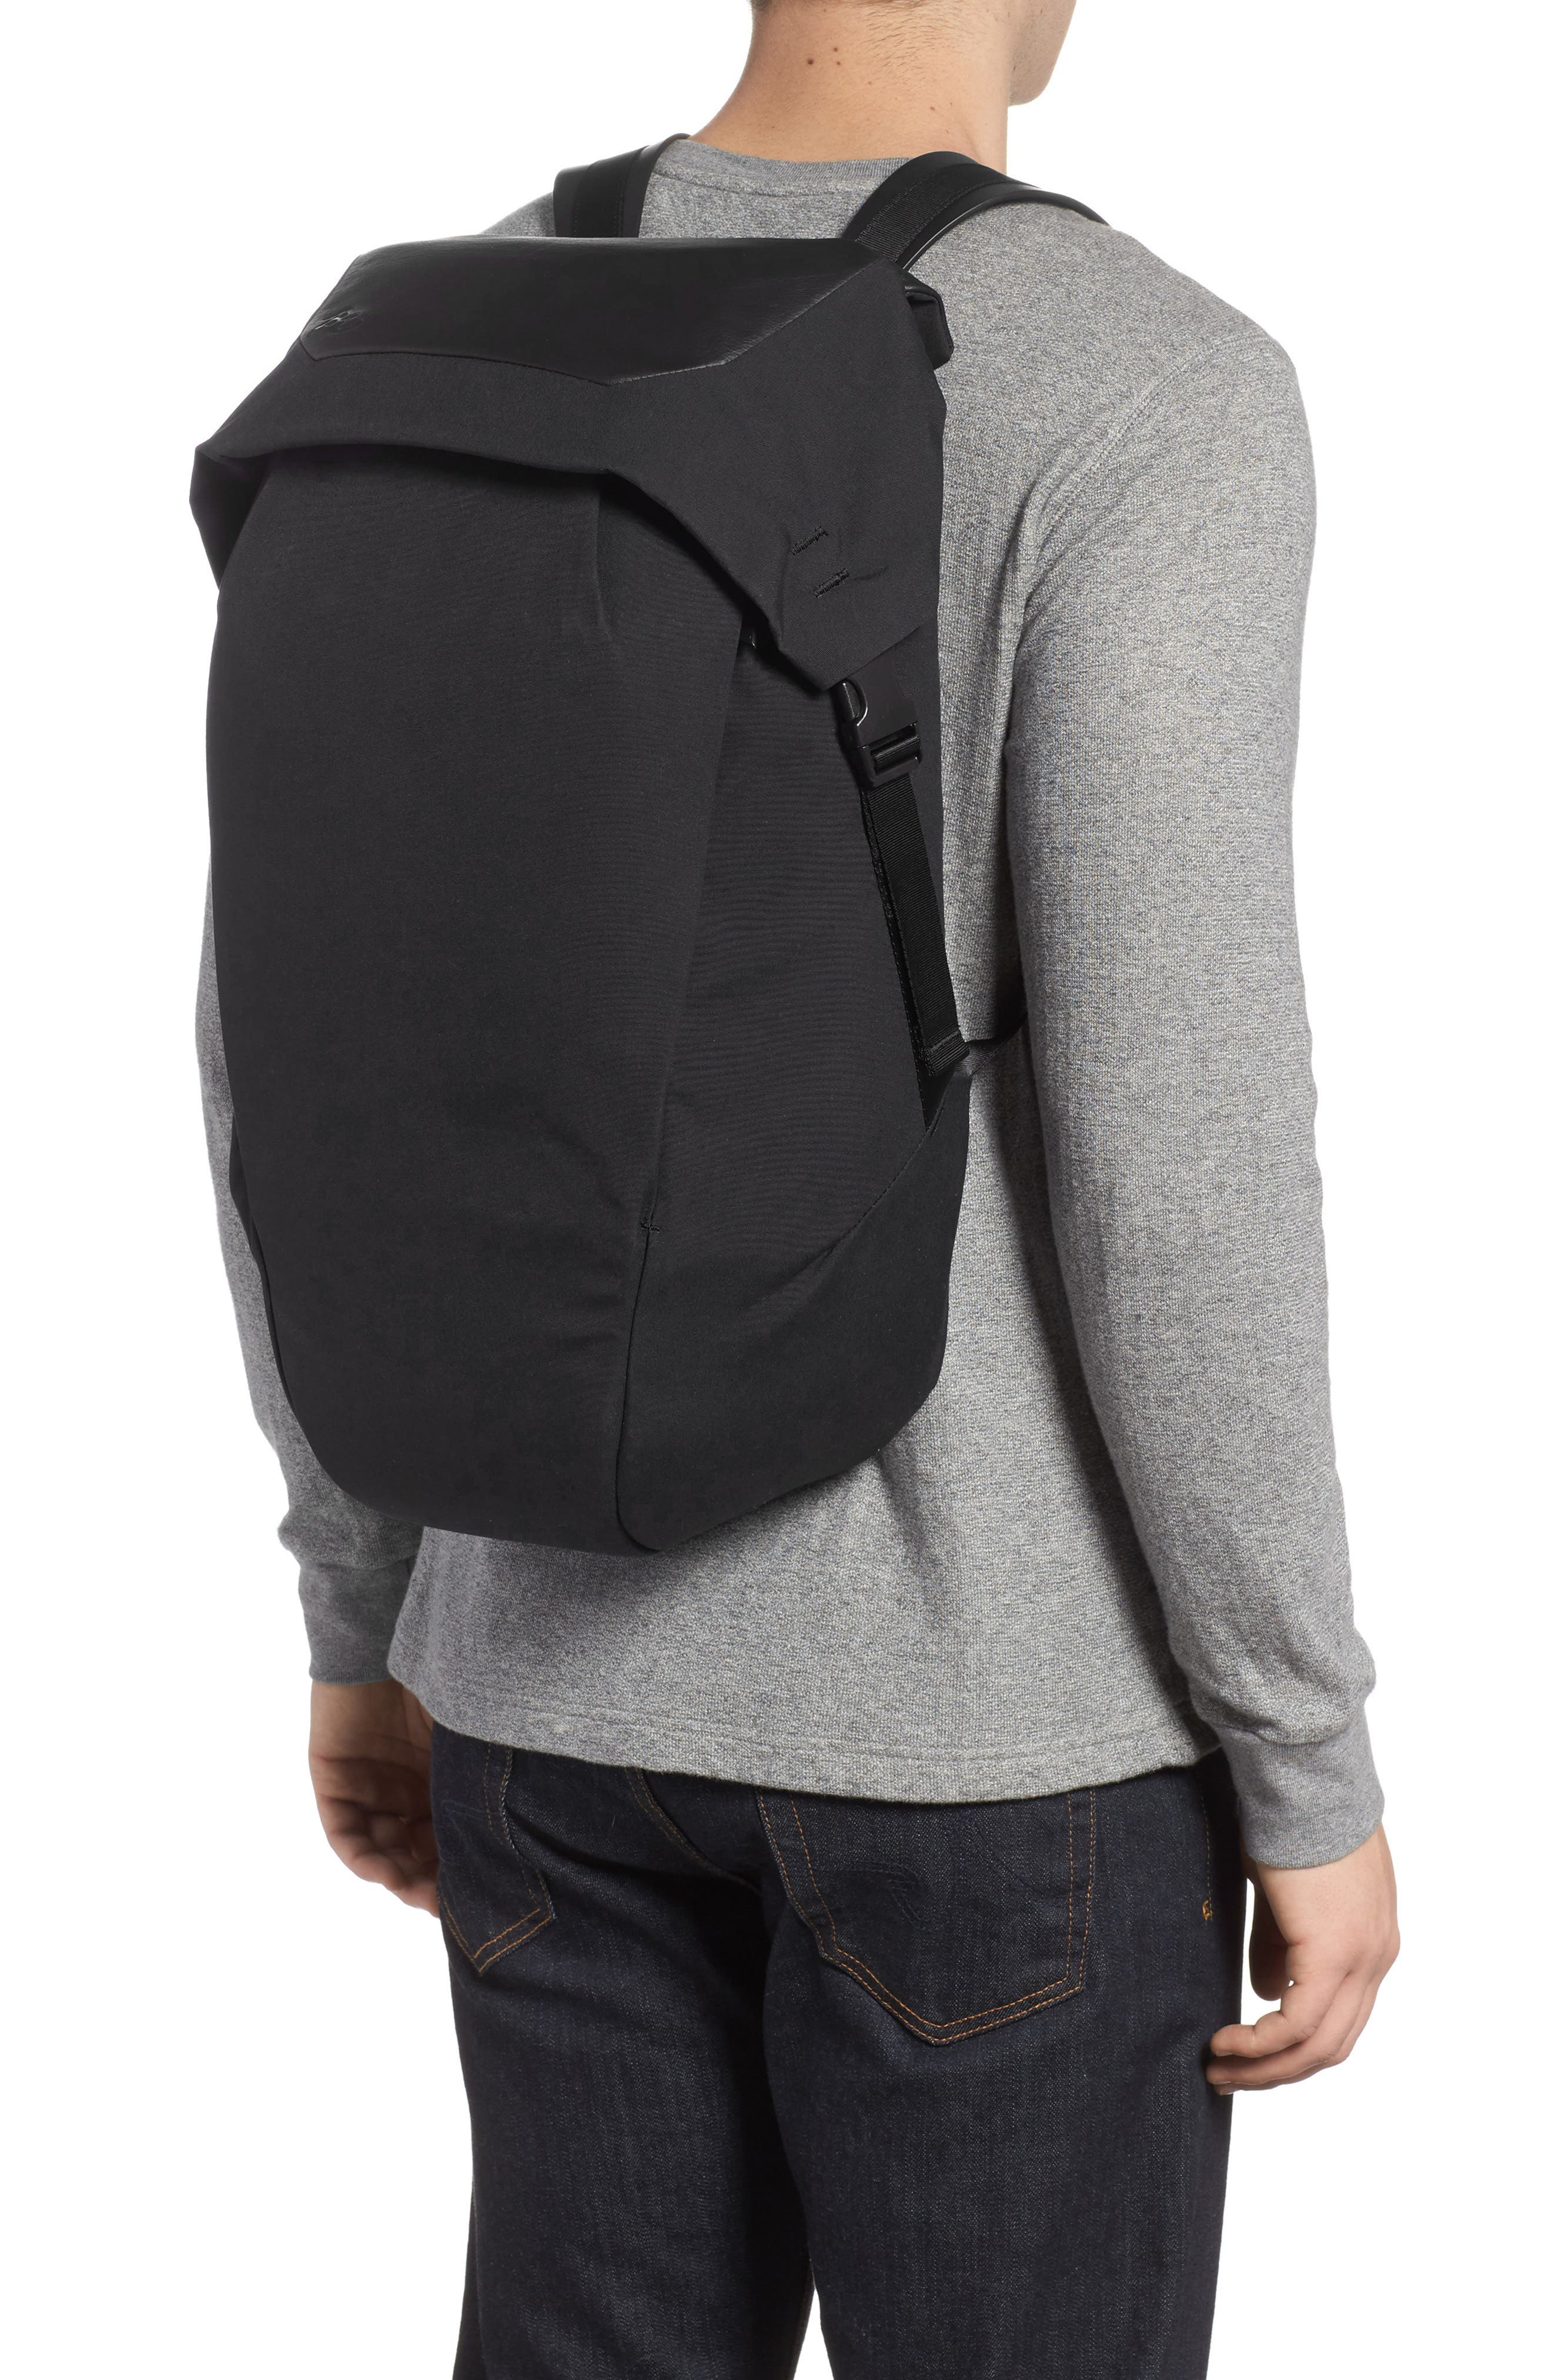 Locker Pack Lux Backpack,                             Alternate thumbnail 2, color,                             001